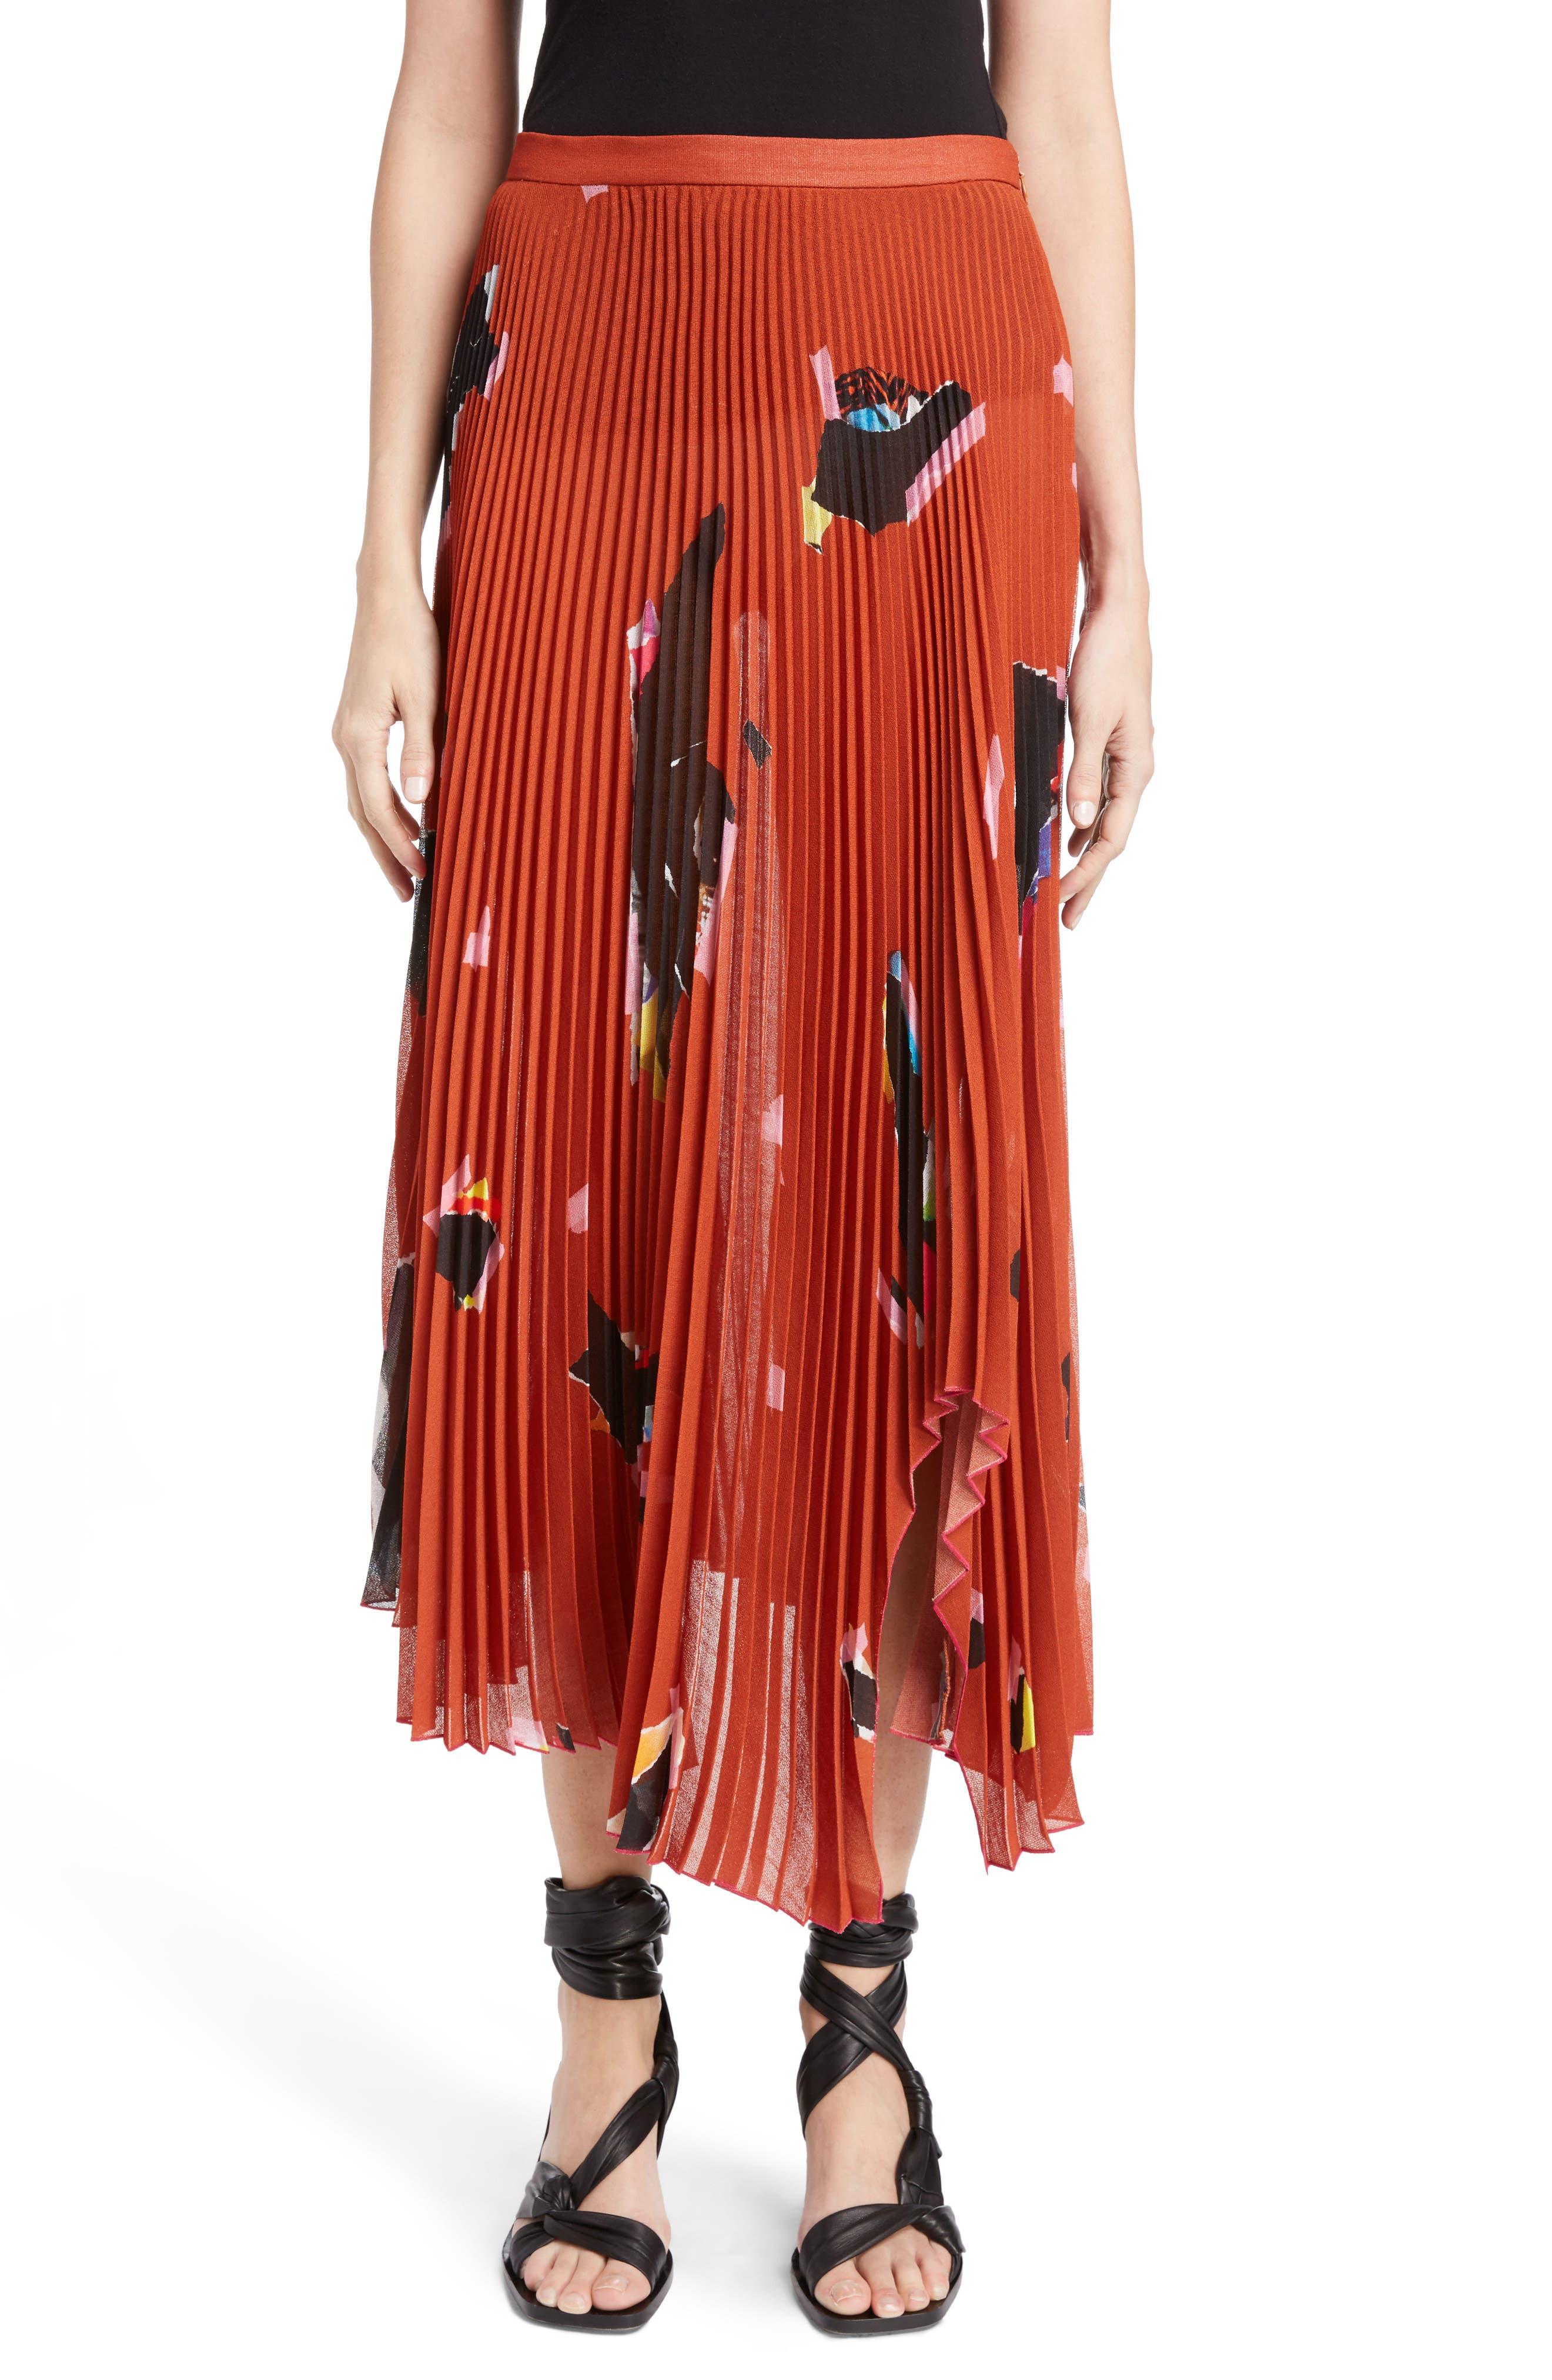 Proenza Schouler Asymmetrical Pleated Skirt